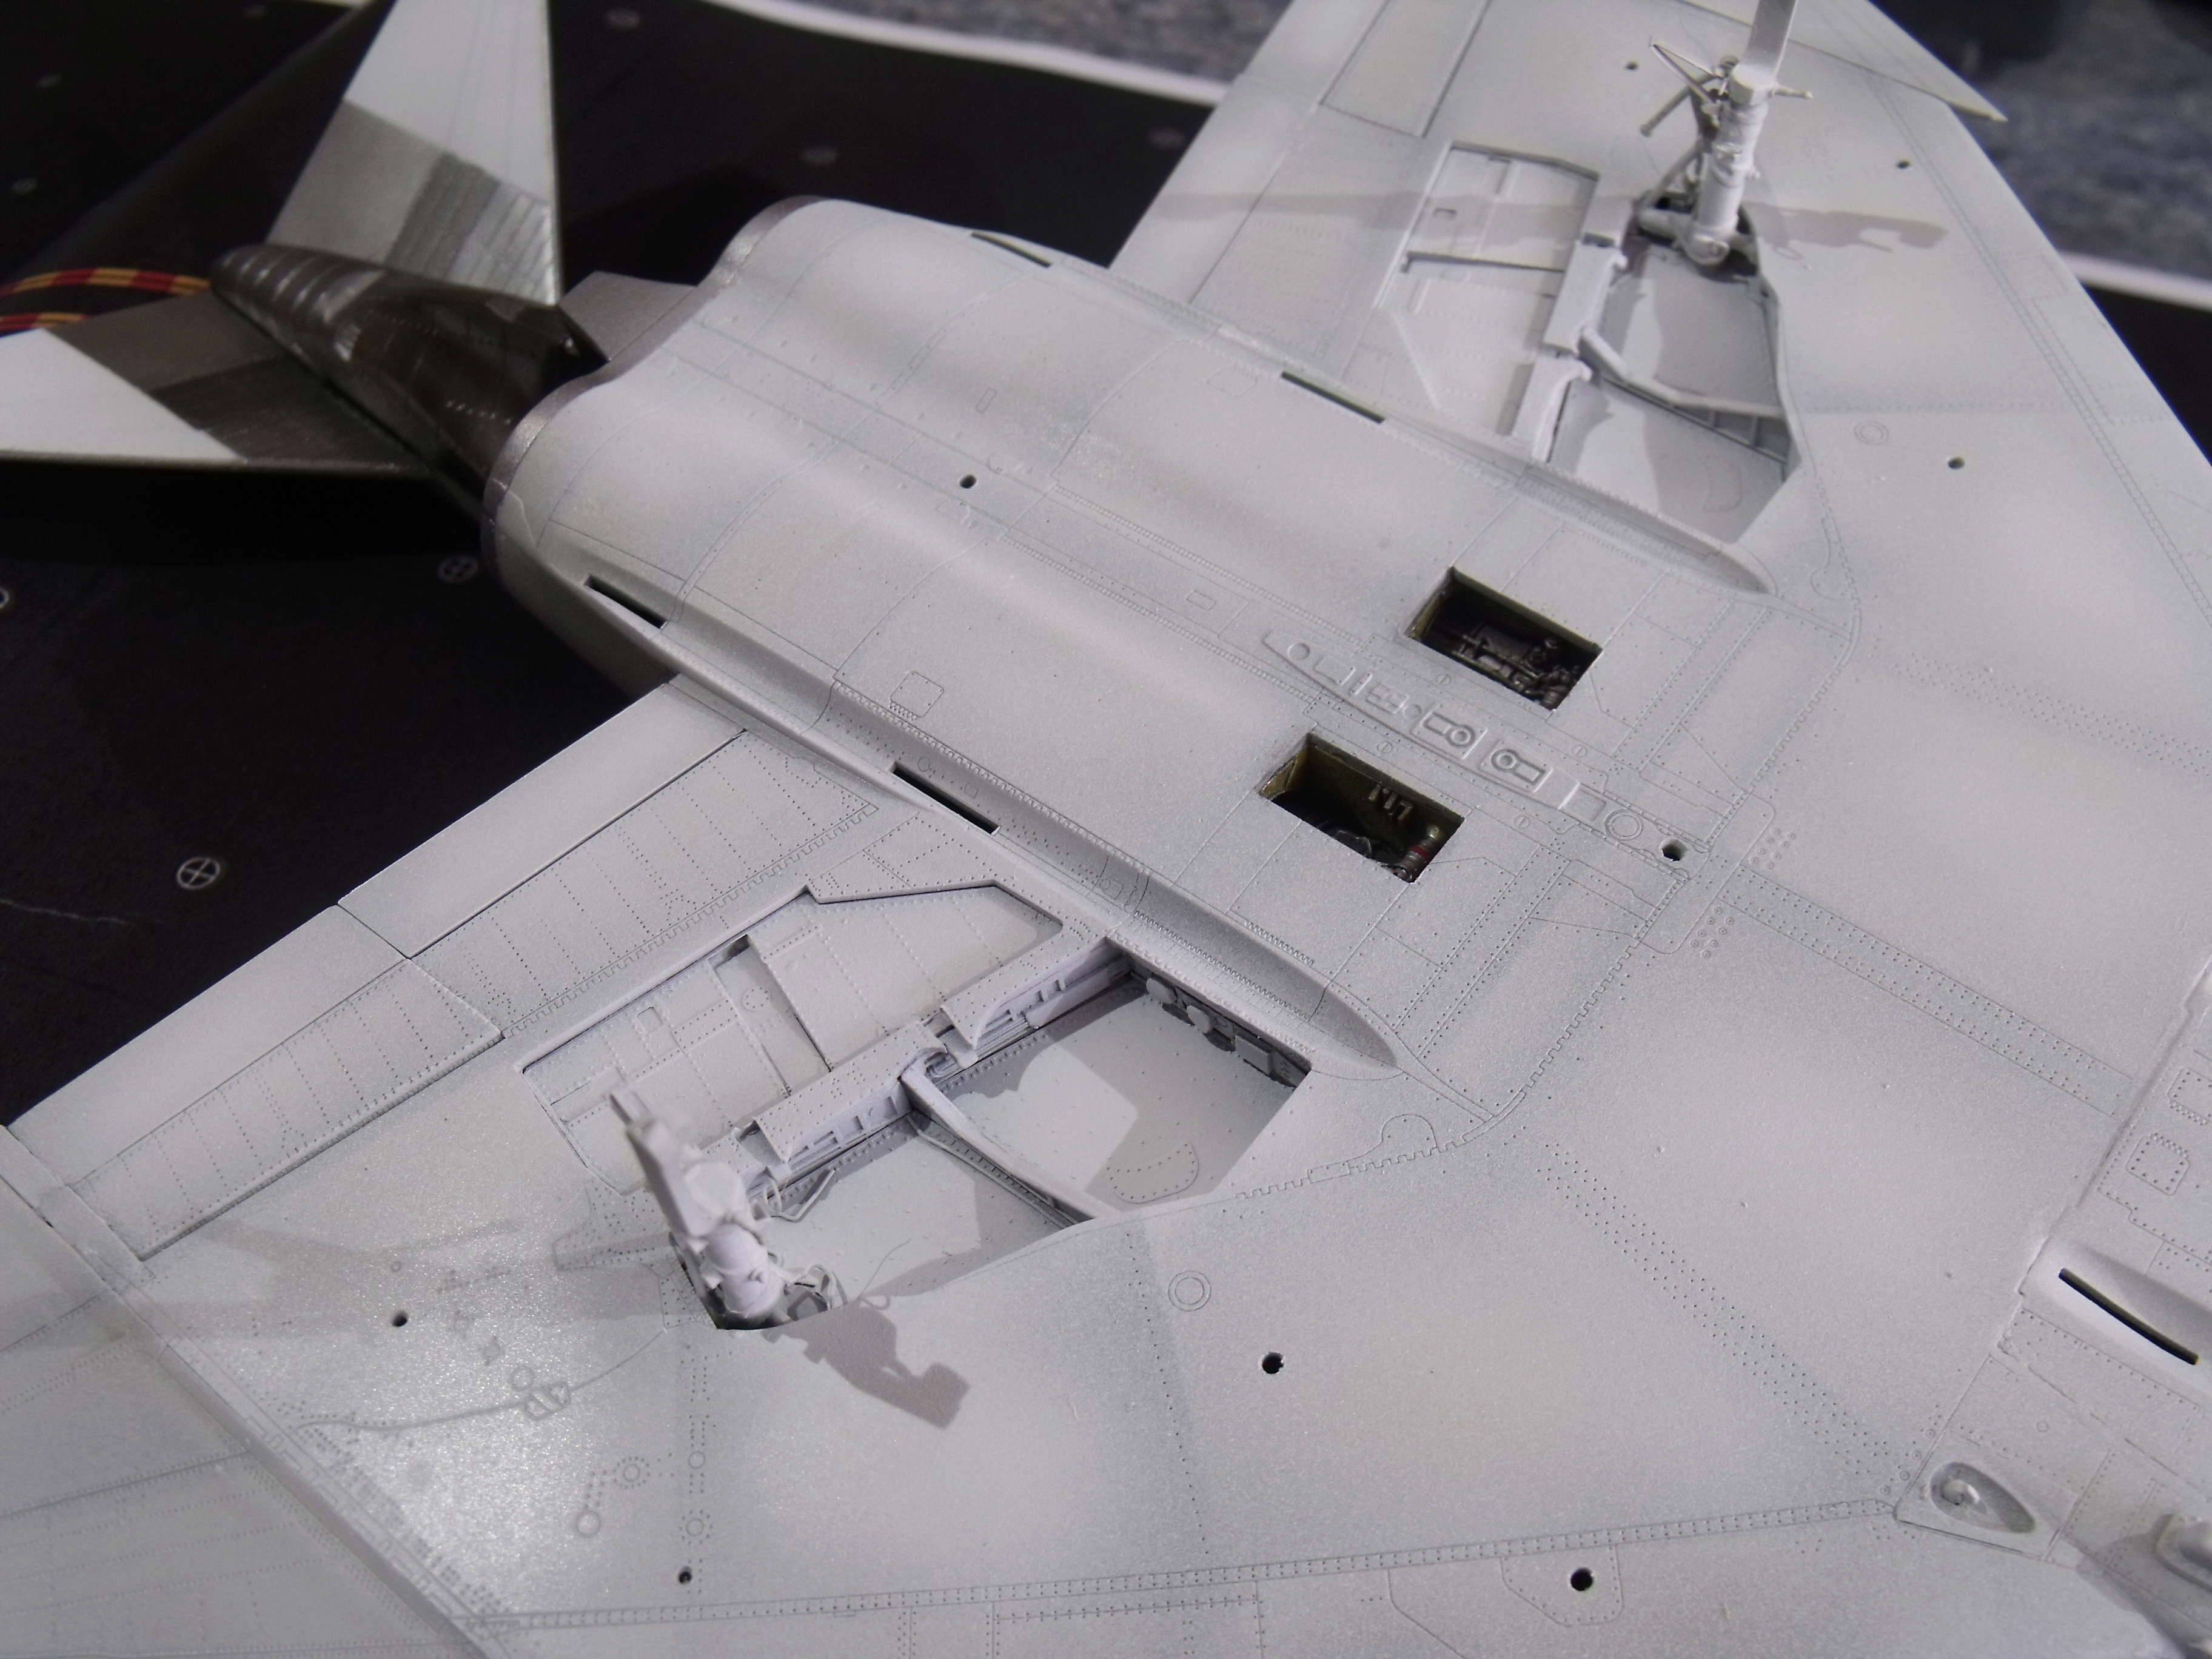 F-4 B Phantom 1/48° - VF-51 - 1972 - Début de patine. - Page 4 Dscf7137